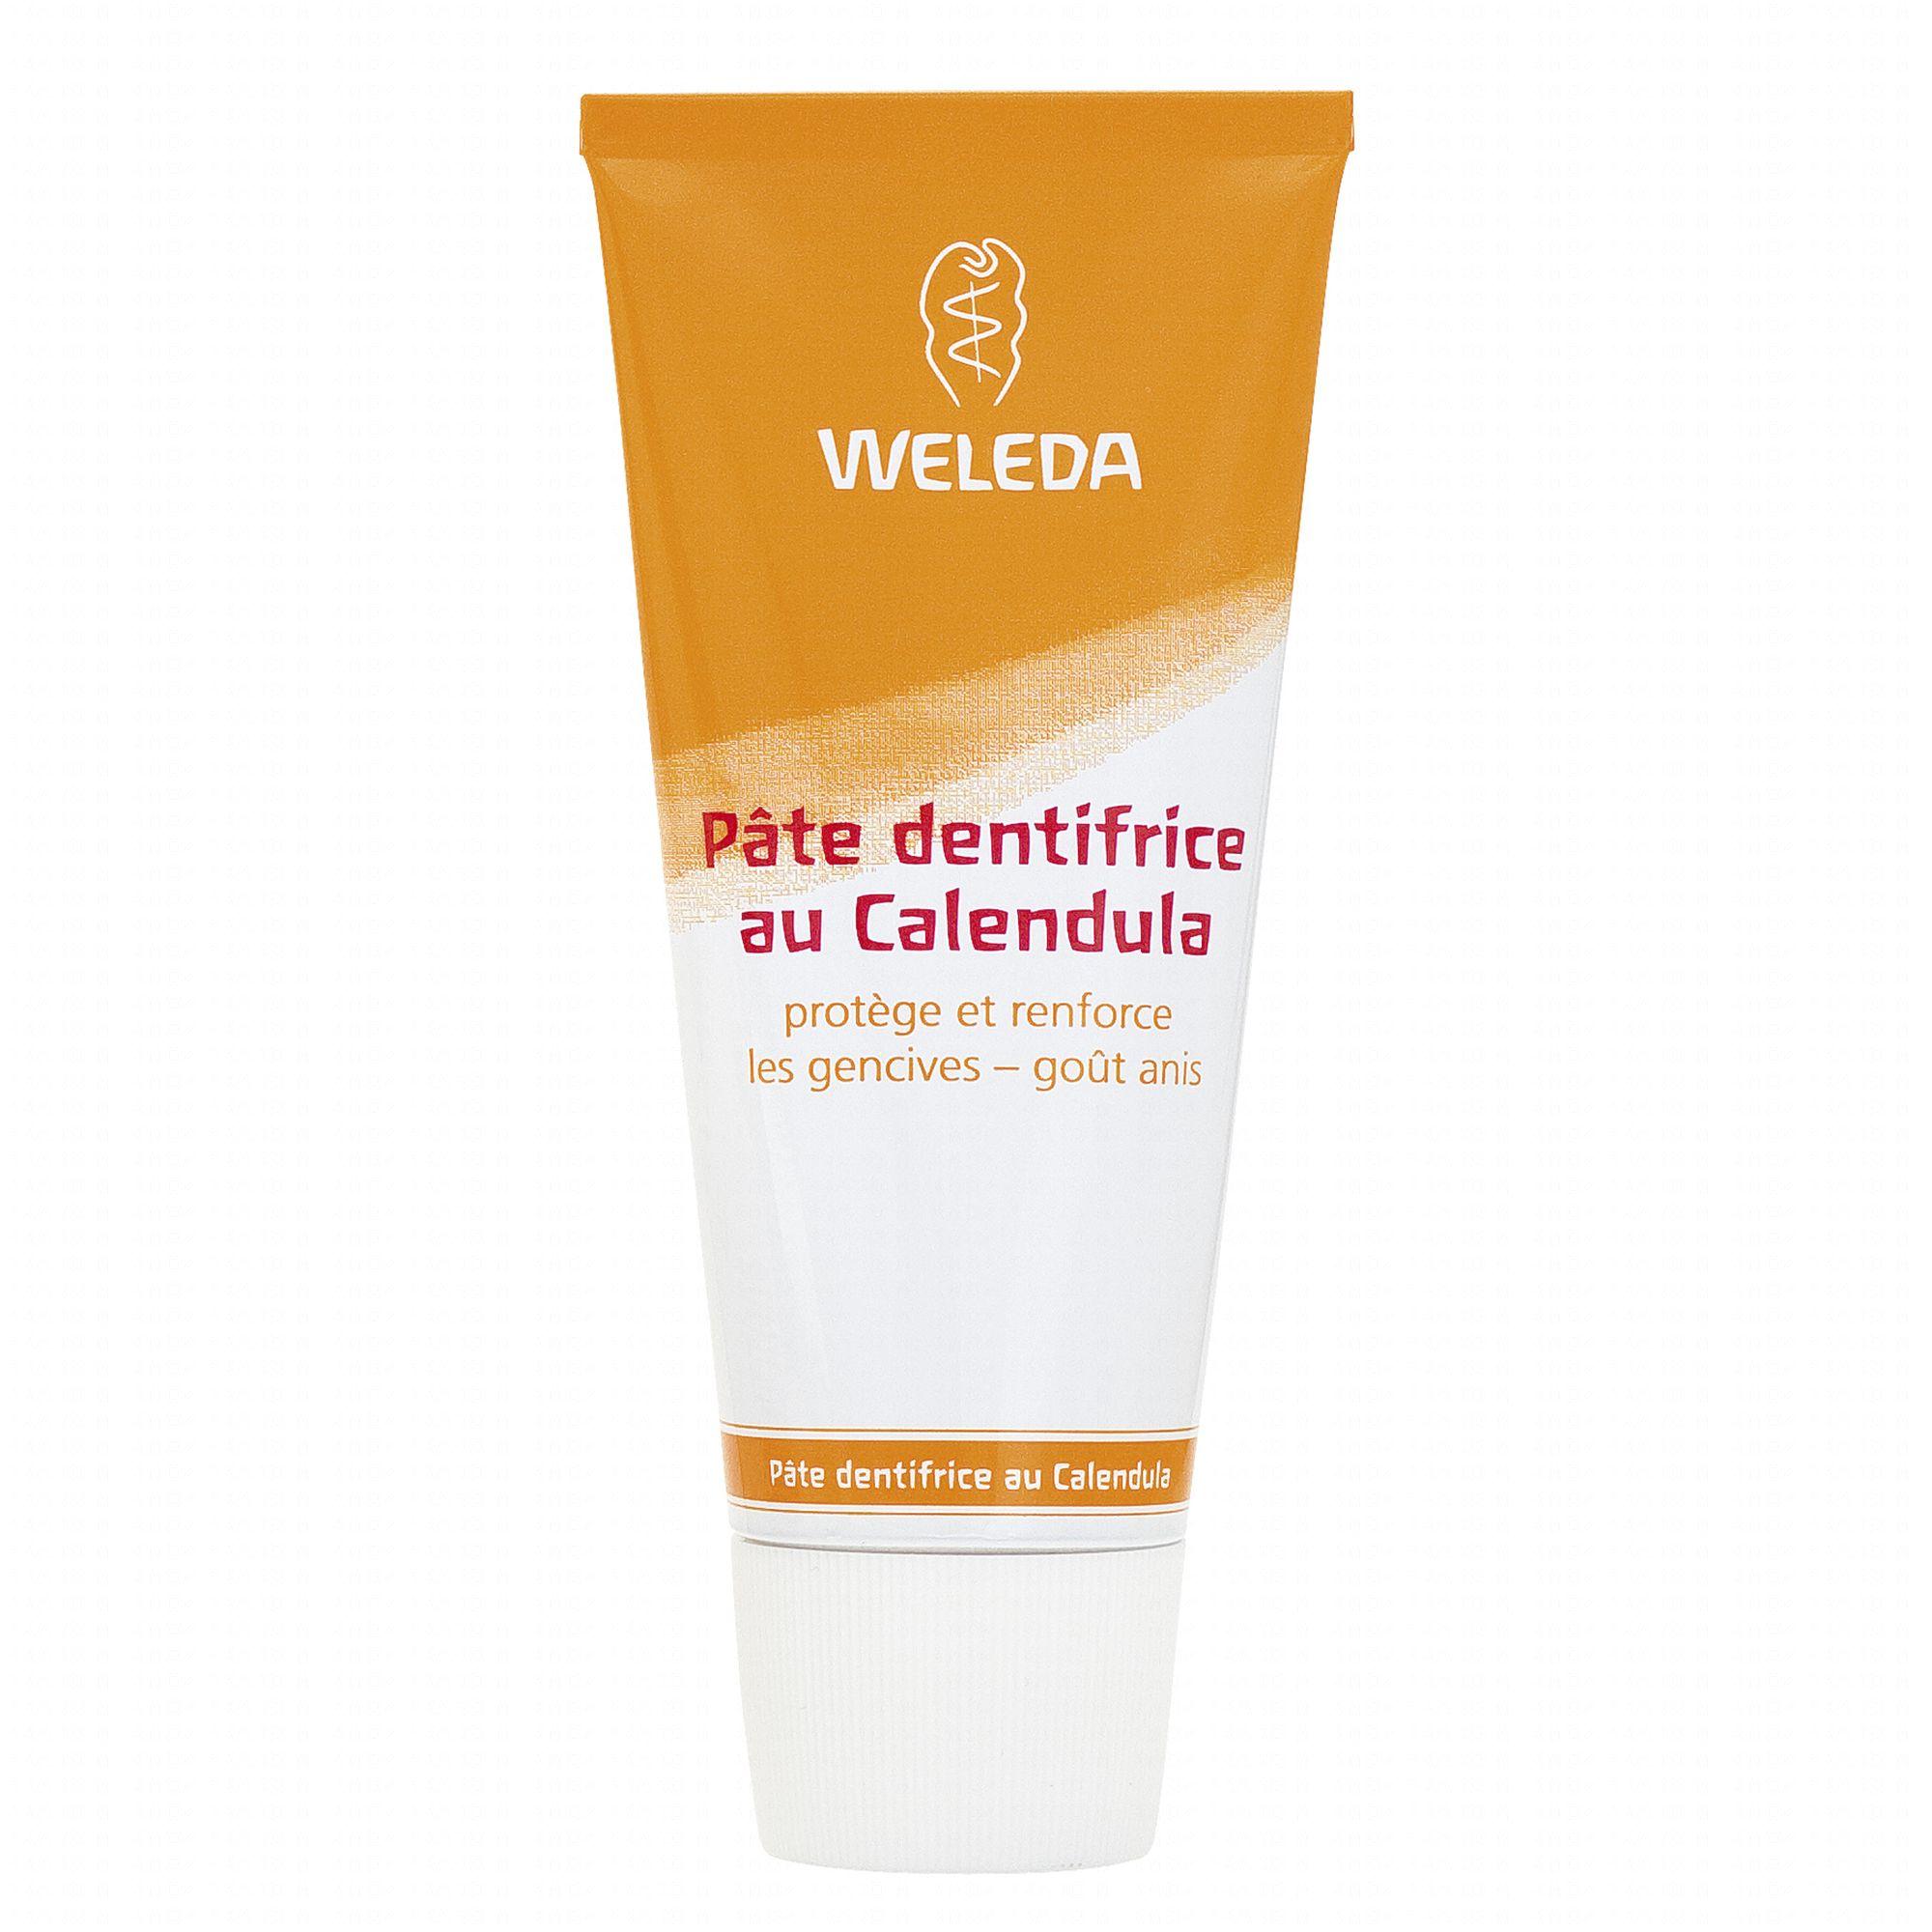 Weleda-Pate-dentifrice-au-Calendula